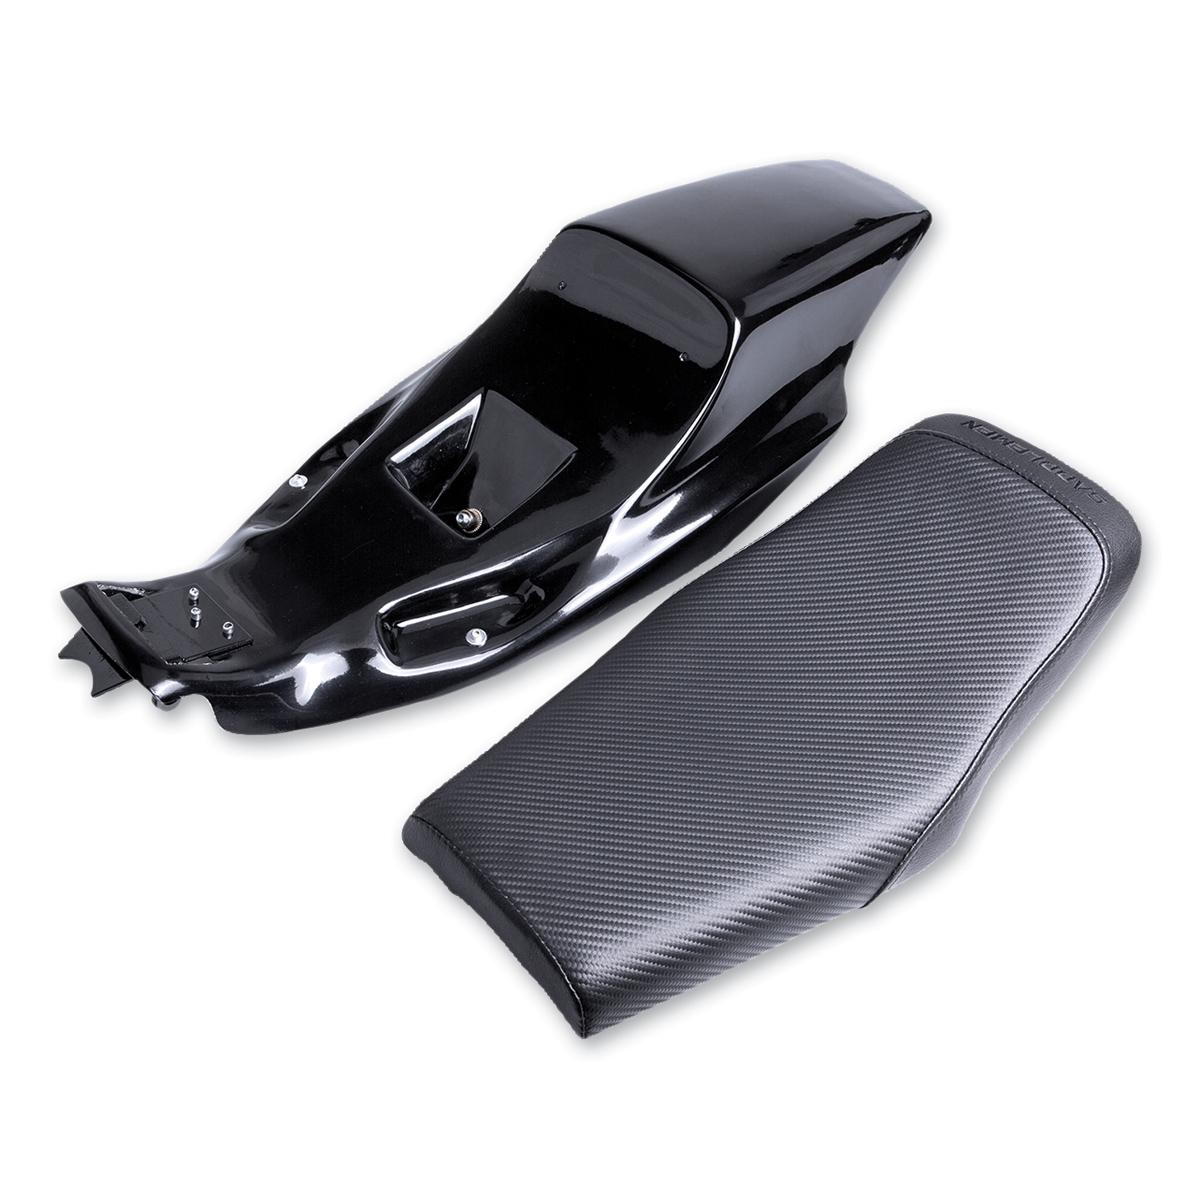 Saddlemen Eliminator Tail Section and Carbon Fiber Seat Kits